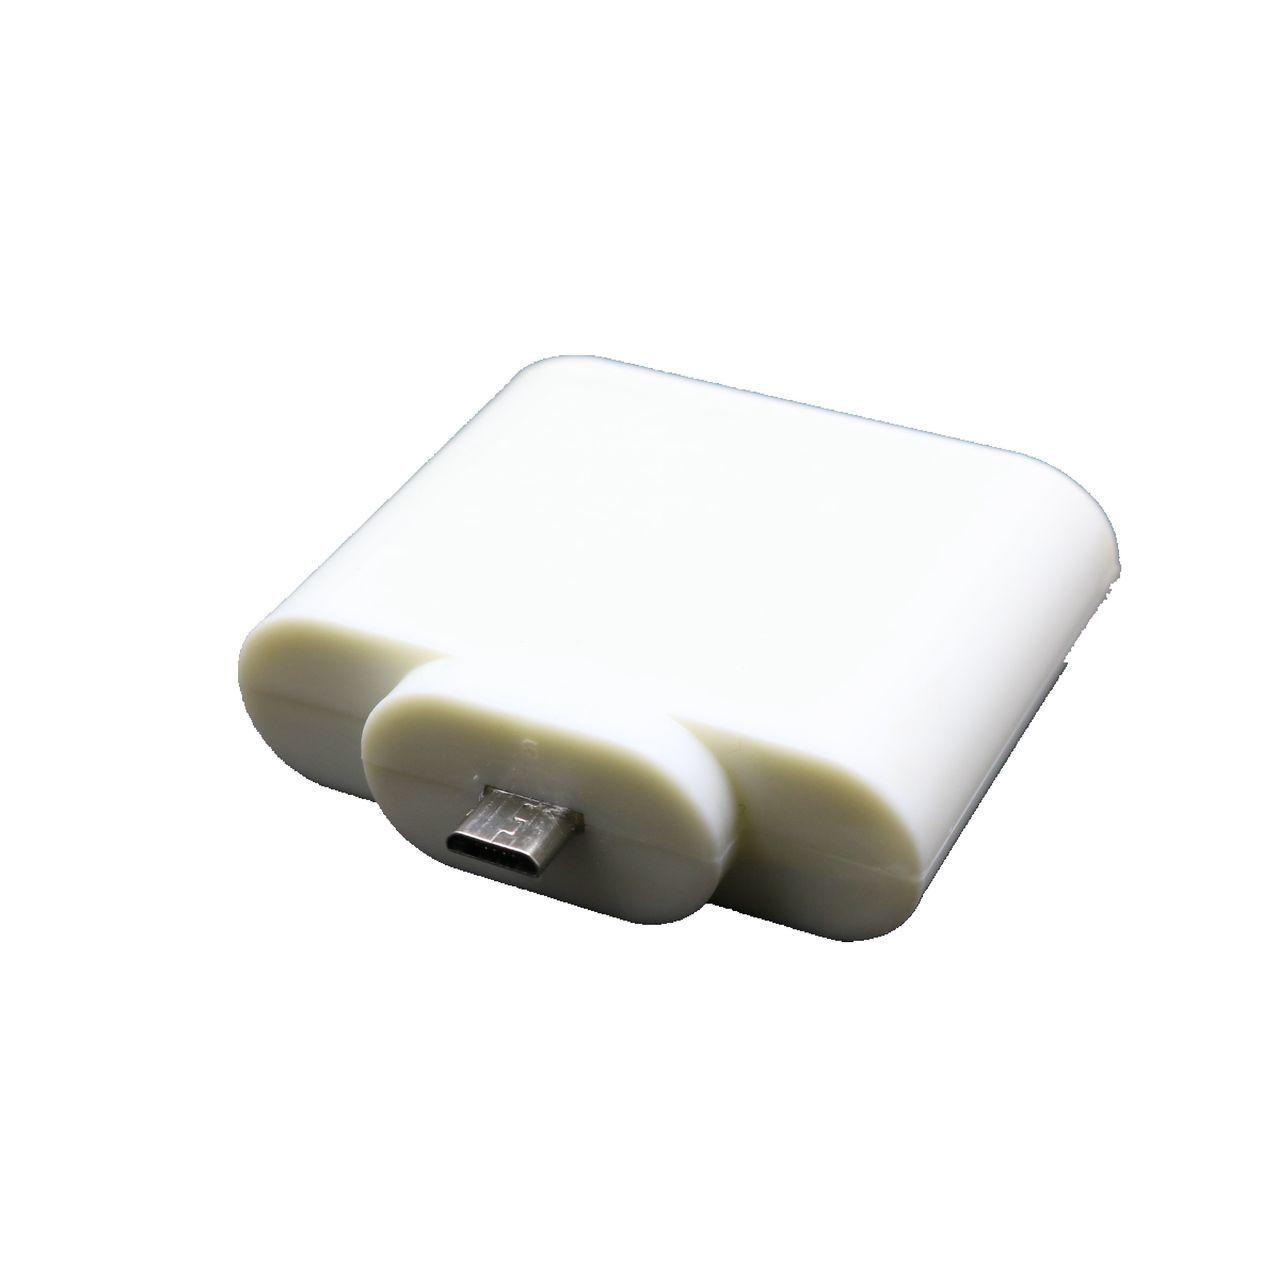 Micro usb NFC lettore di 4/7 byte UID adaptible per il sistema AndroidMicro usb NFC lettore di 4/7 byte UID adaptible per il sistema Android